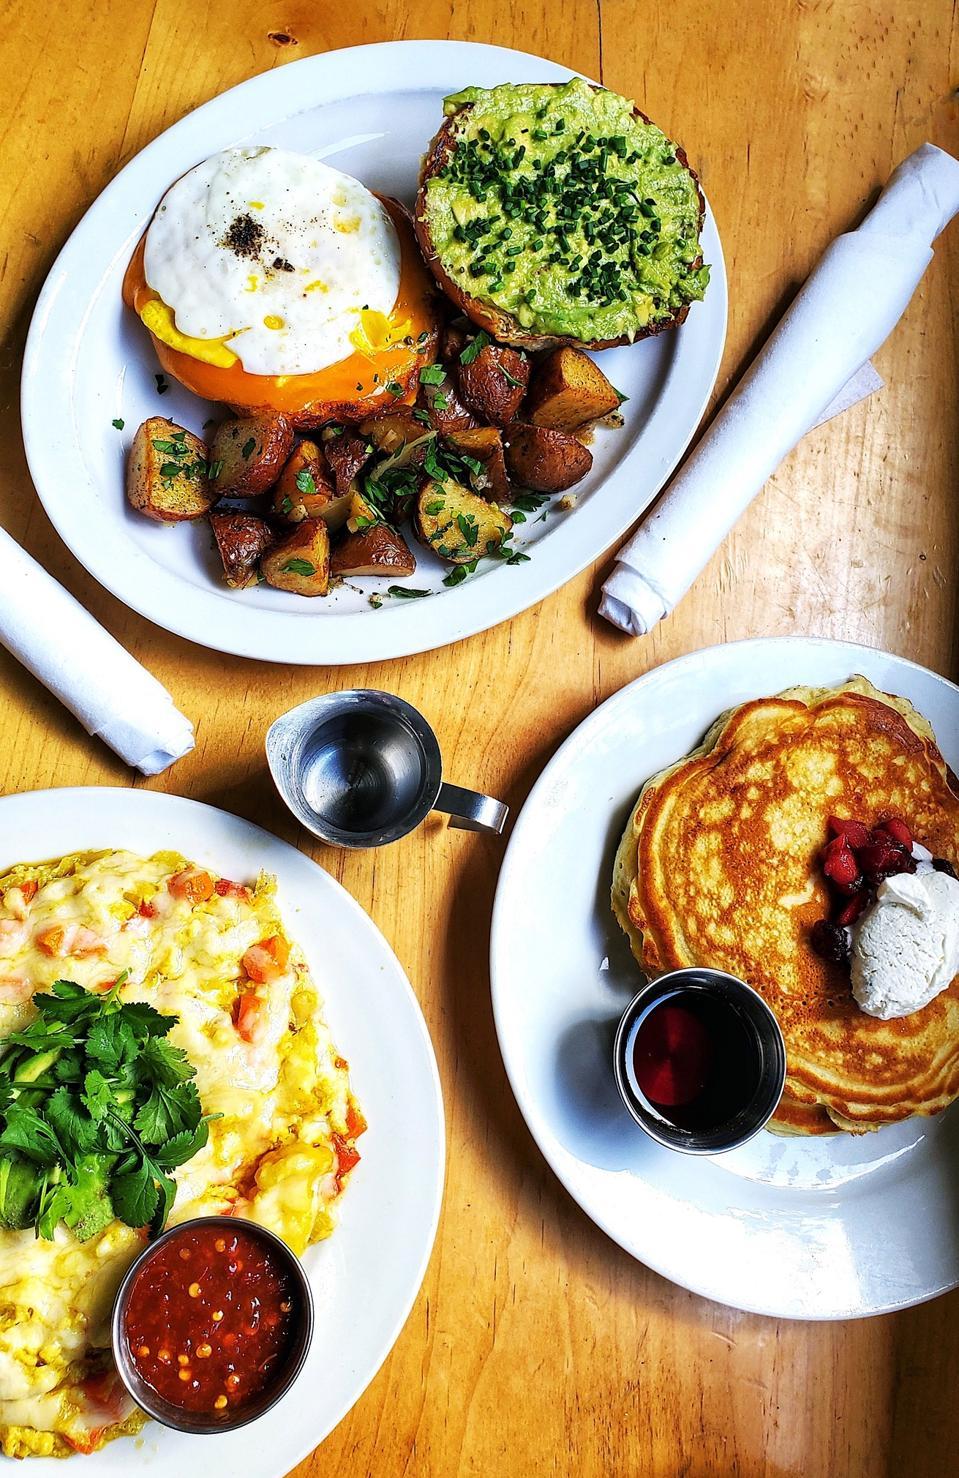 Fried egg sandwich, veggie mess, pancakes on table